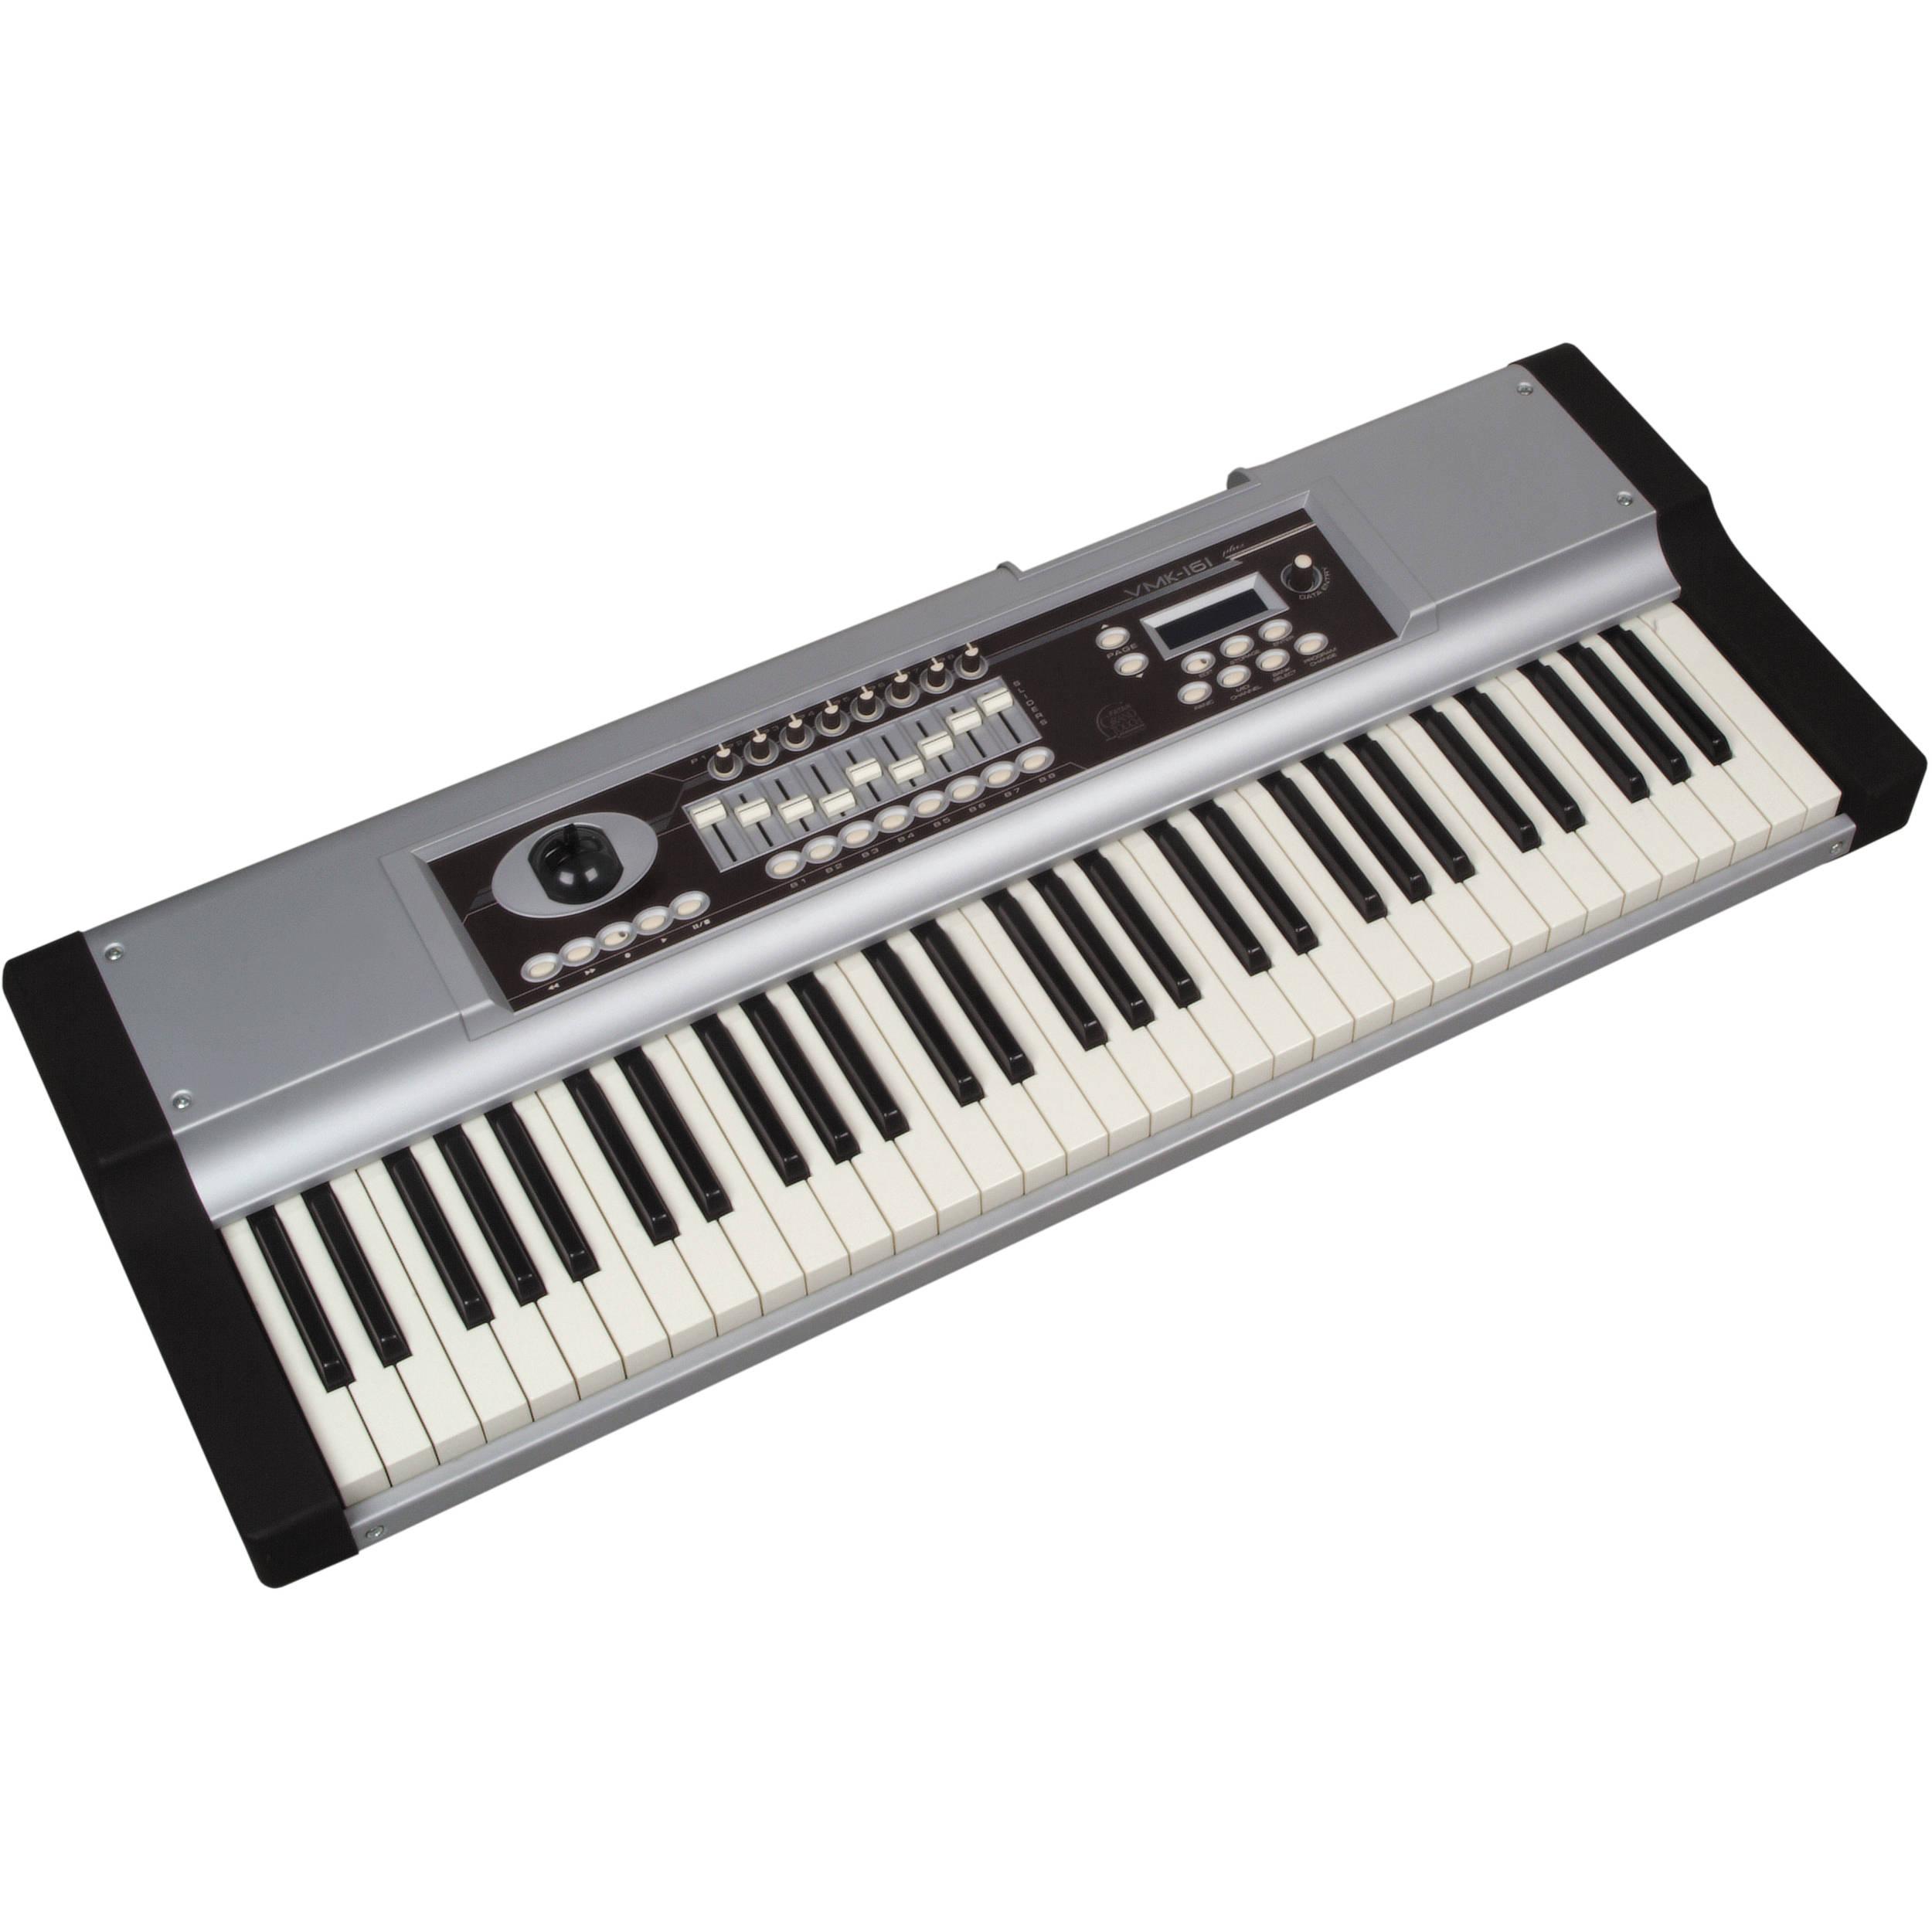 studiologic vmk 161 organ plus keyboard vmk 161 plus organ b h. Black Bedroom Furniture Sets. Home Design Ideas